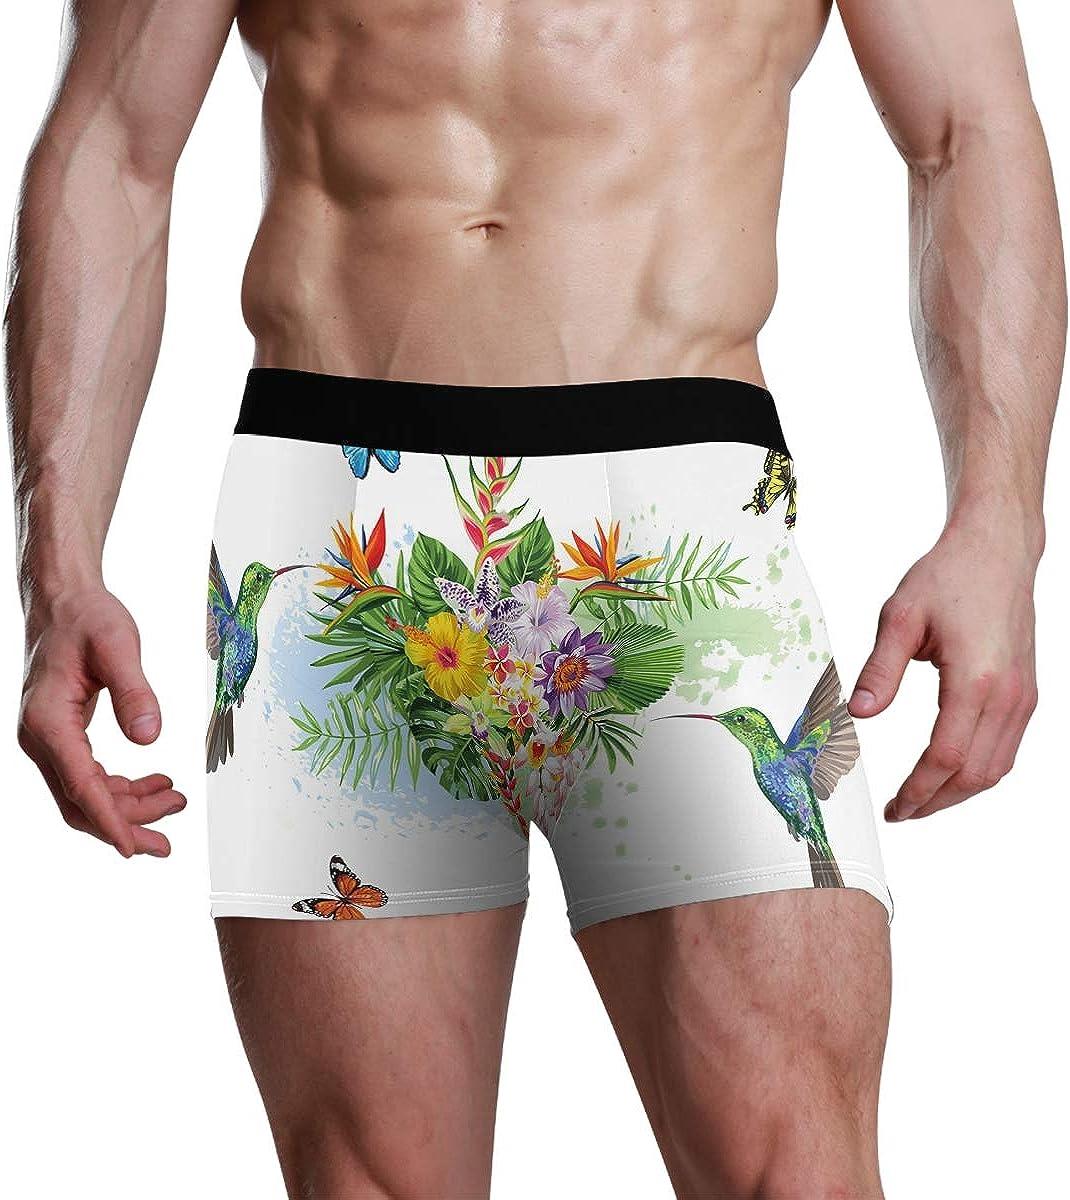 Mens Underwear Briefs Hummingbird and Butterfly Breathable Long Boxer Briefs Underwear Boys